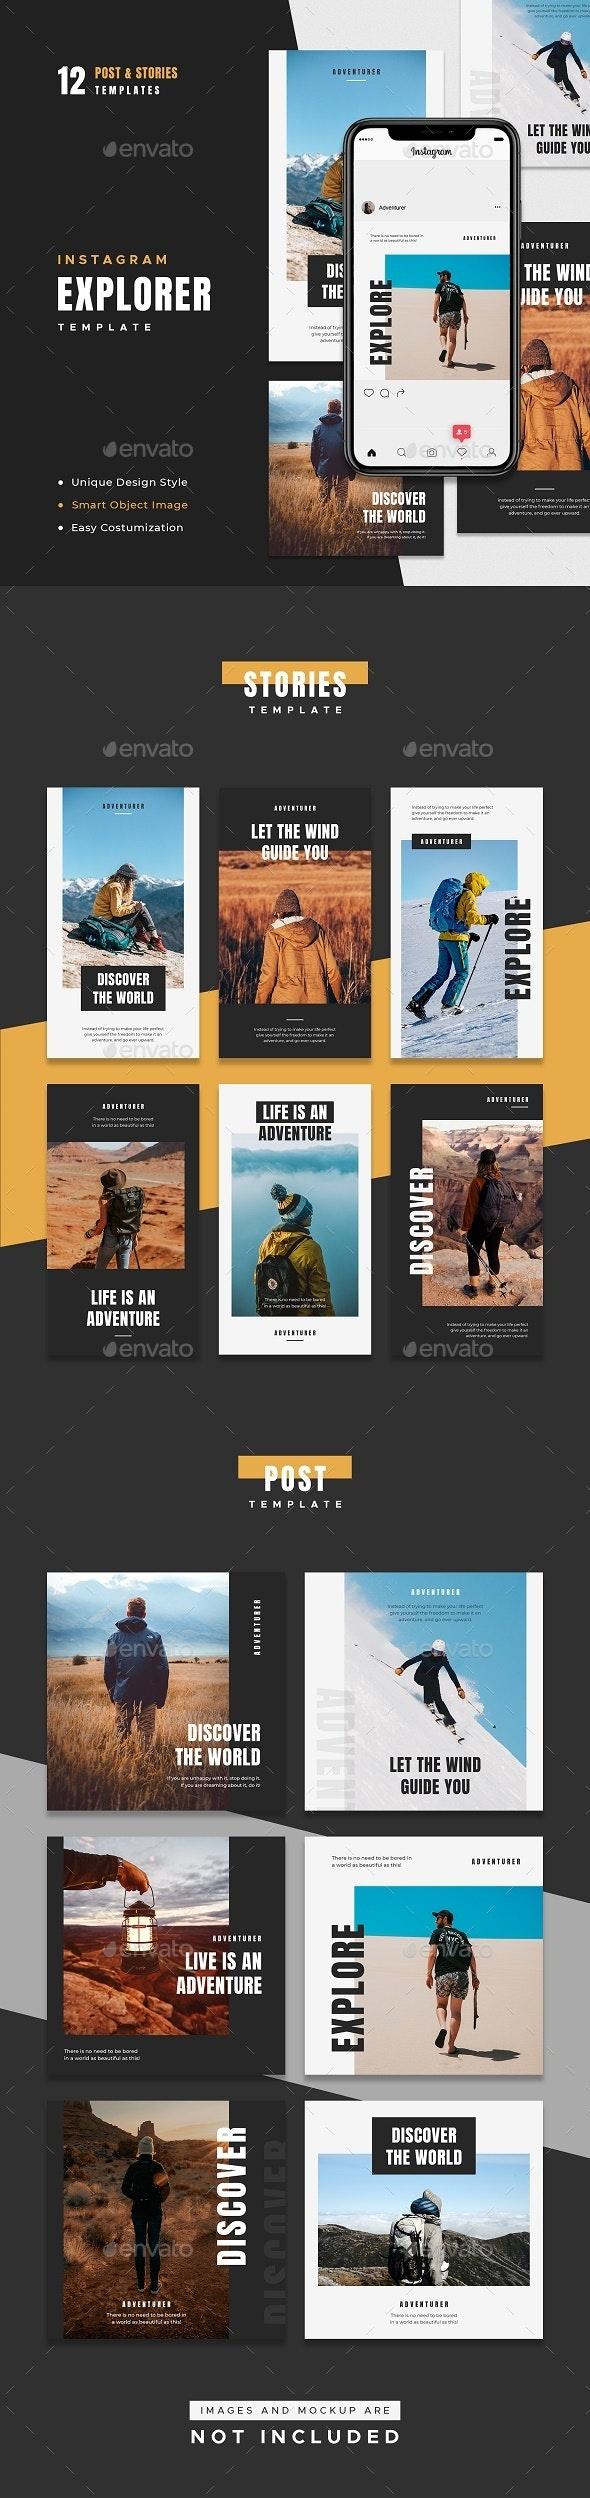 Explorer Instagram Template - Social Media Web Elements